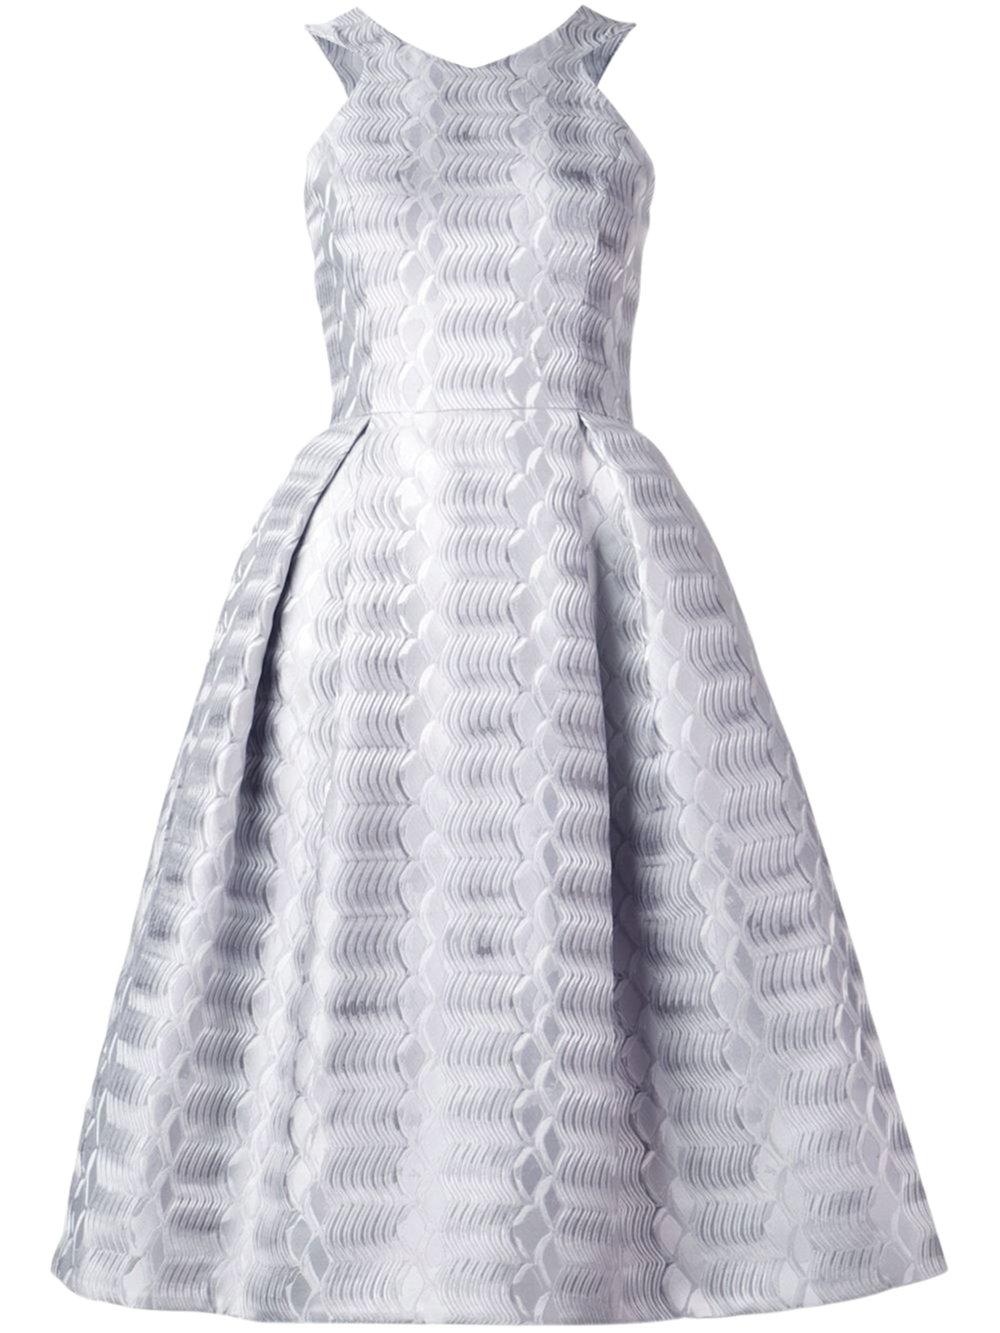 10. Mary Katrantzou 連衣裙 $4,674, farfetch.ca